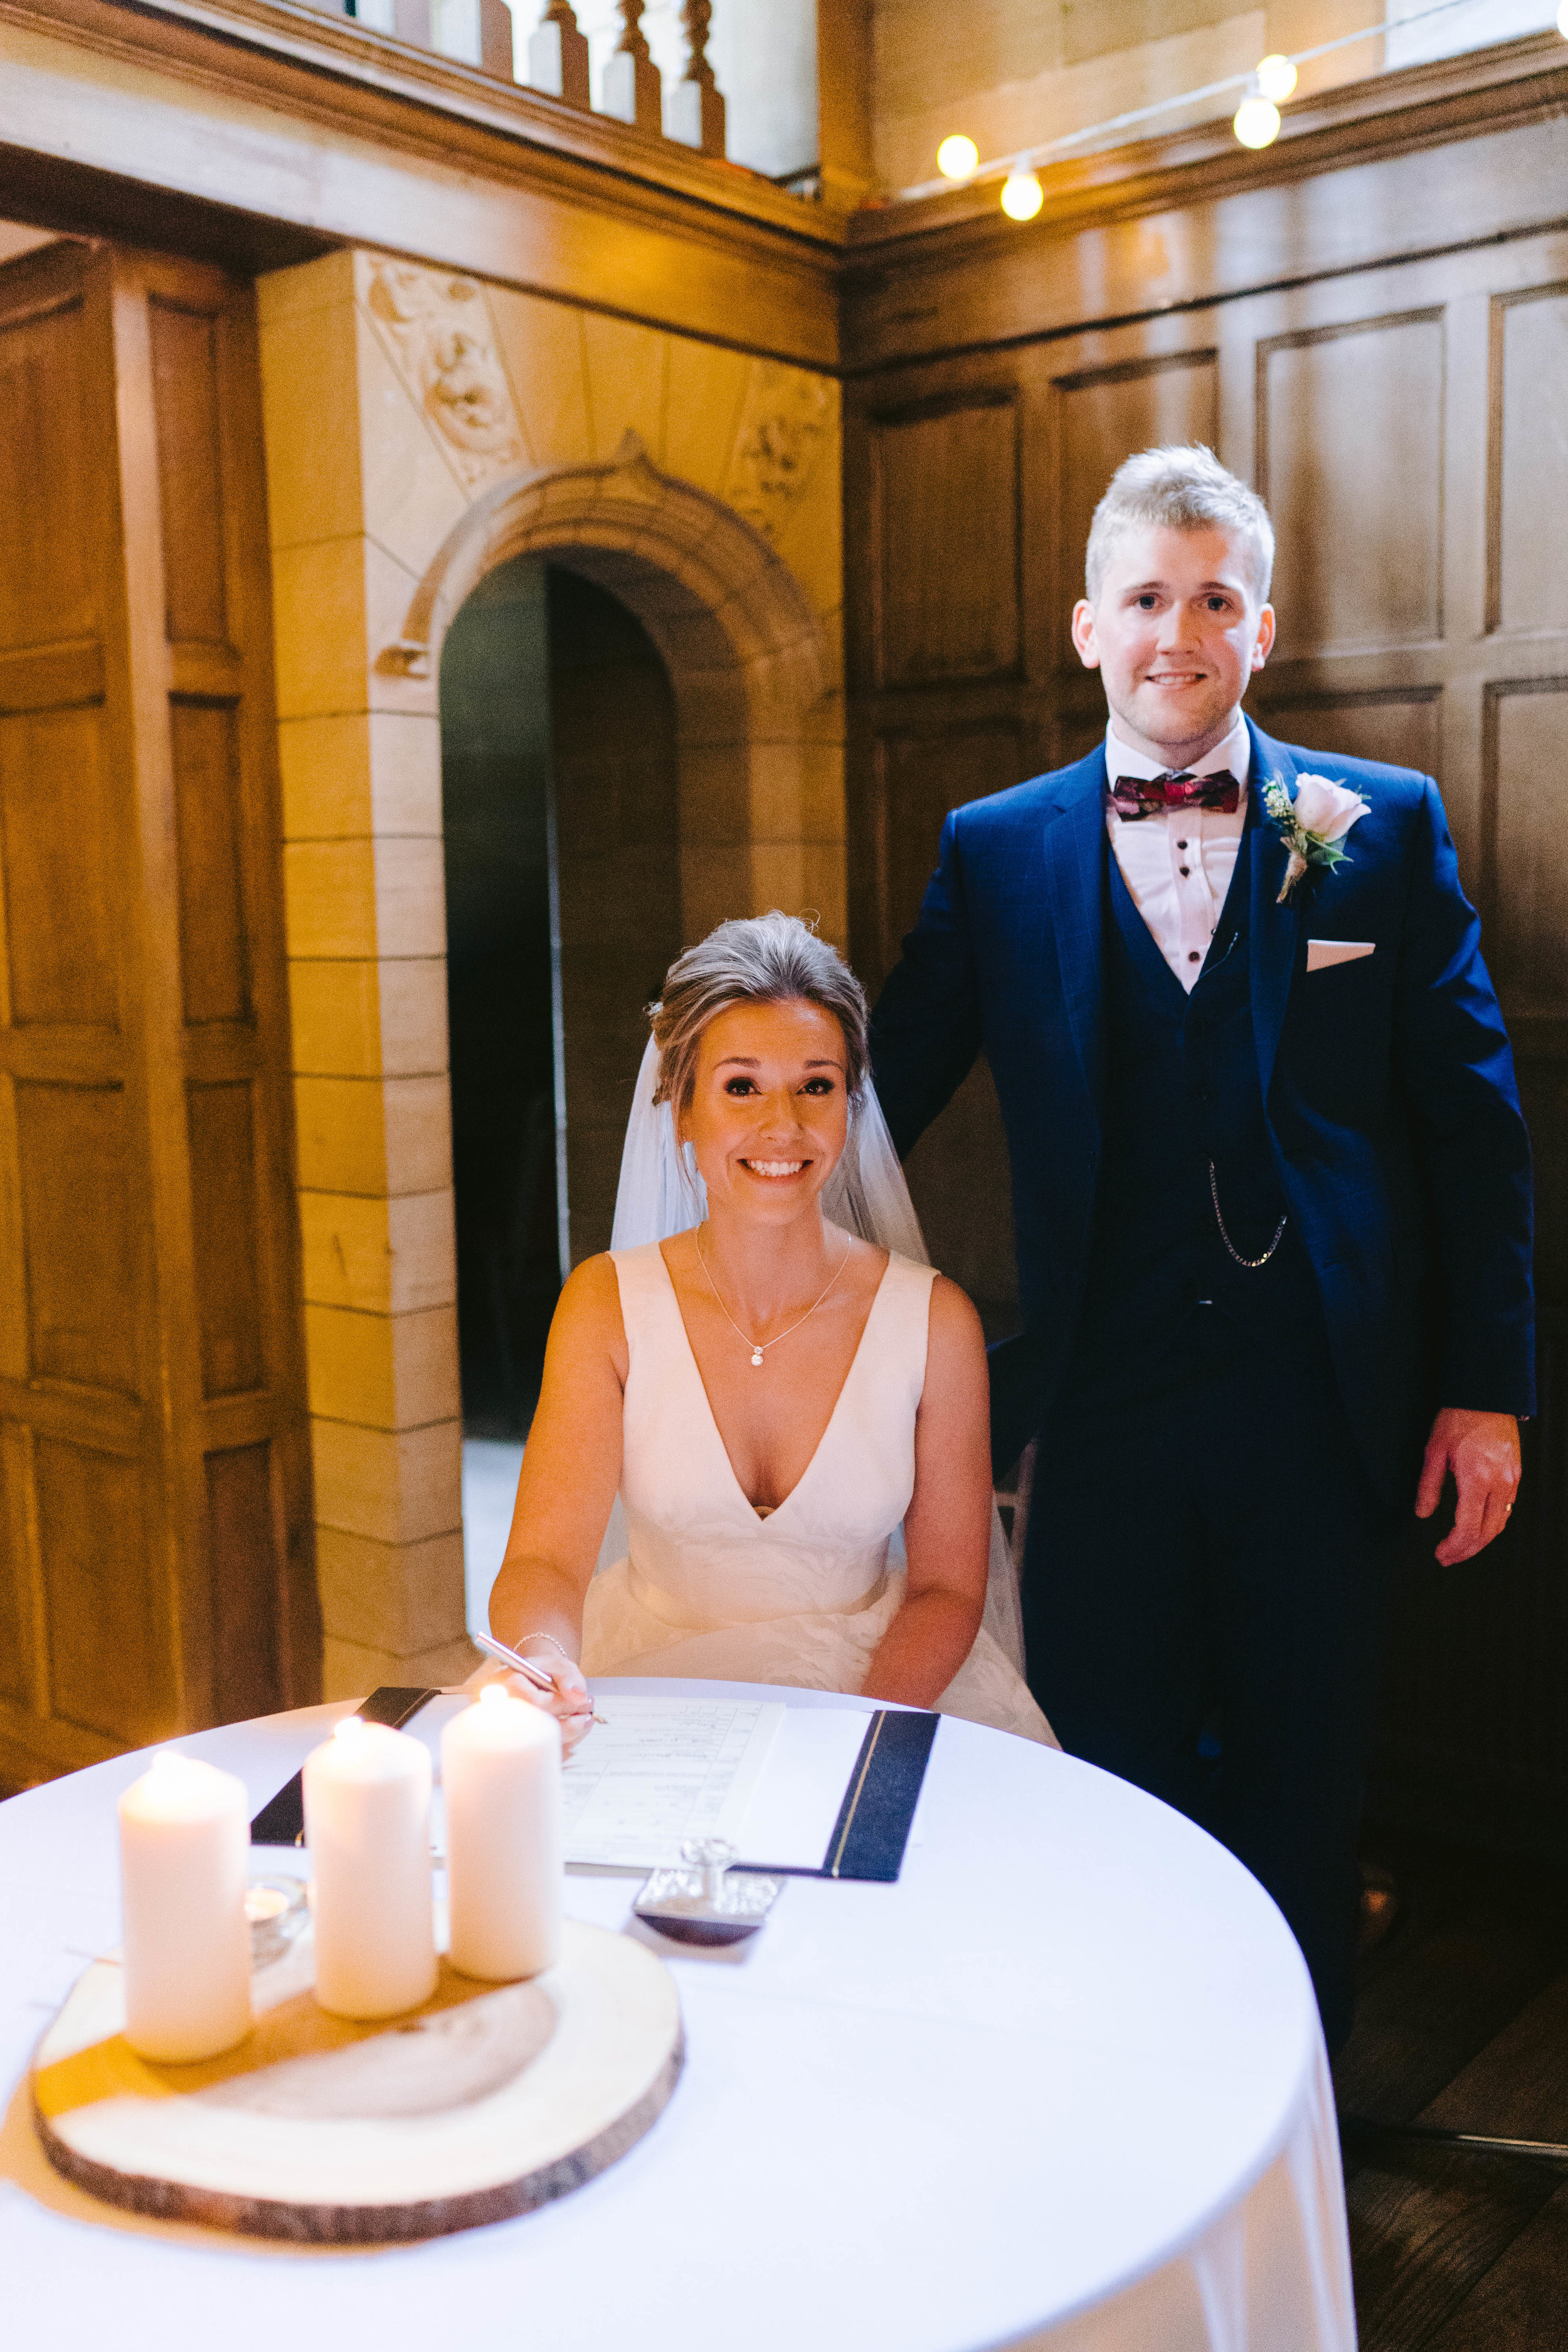 Karin_and_Shauns_Wedding_-_Achnagairn_Castle_-_www.eilidhrobertson.co.uk-535.jpg